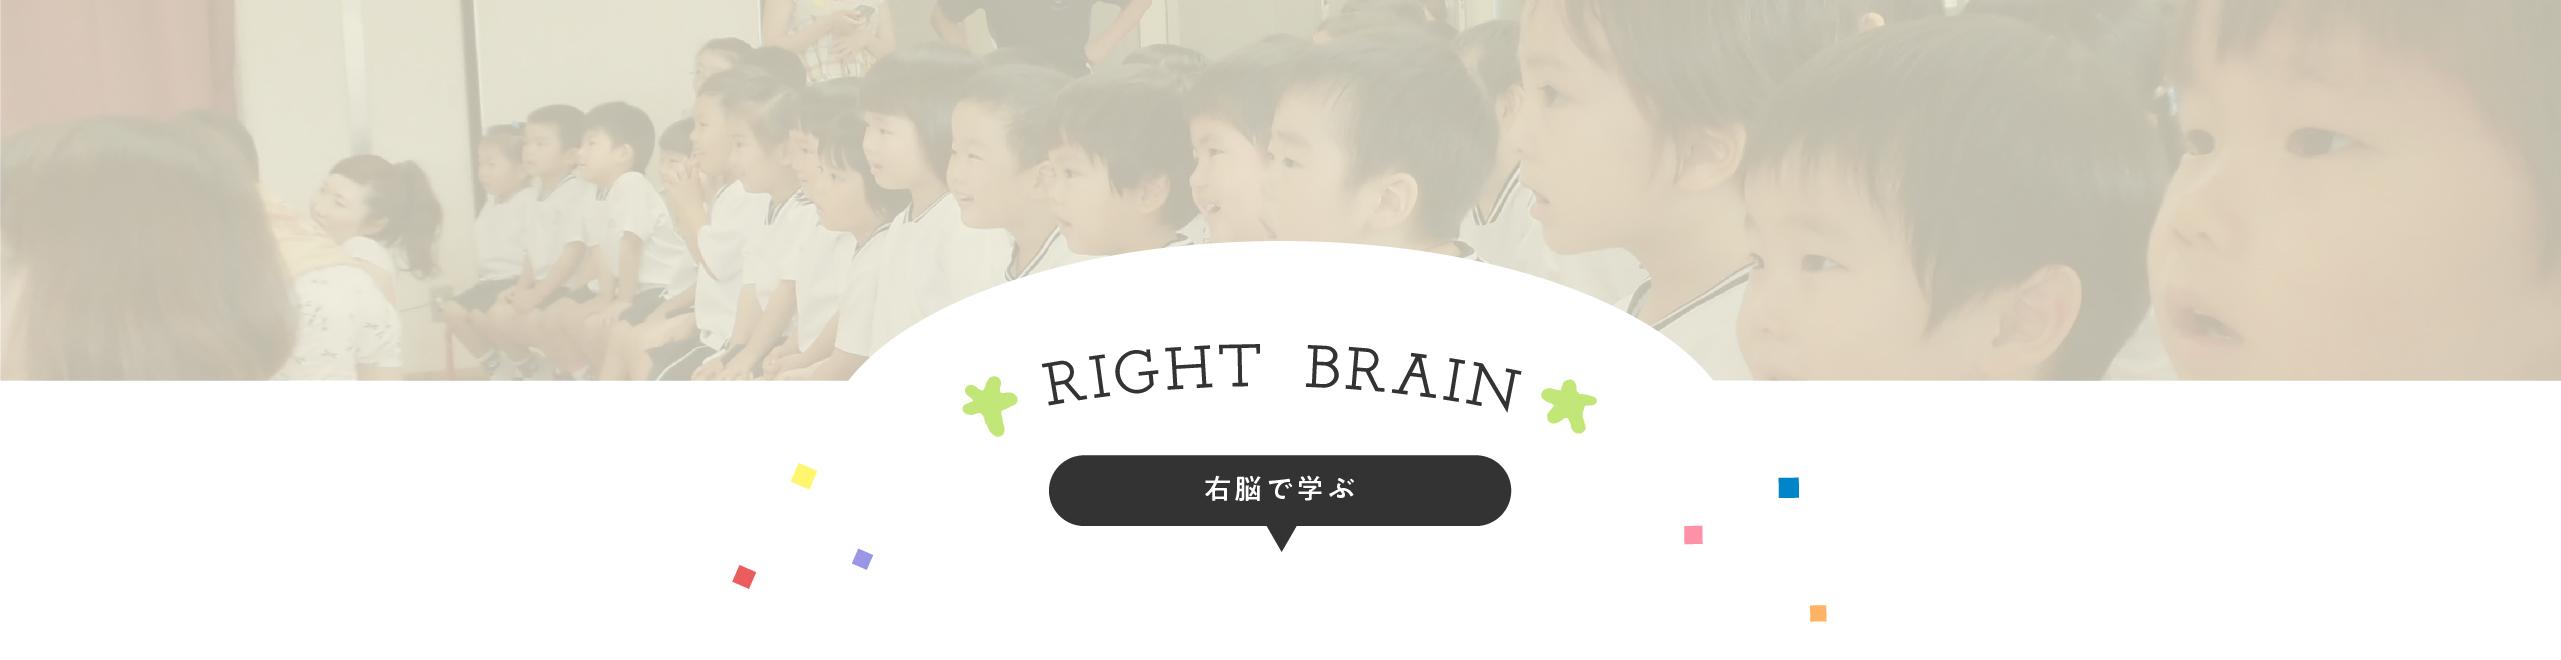 RIGHT BRAIN -右脳で学ぶ-